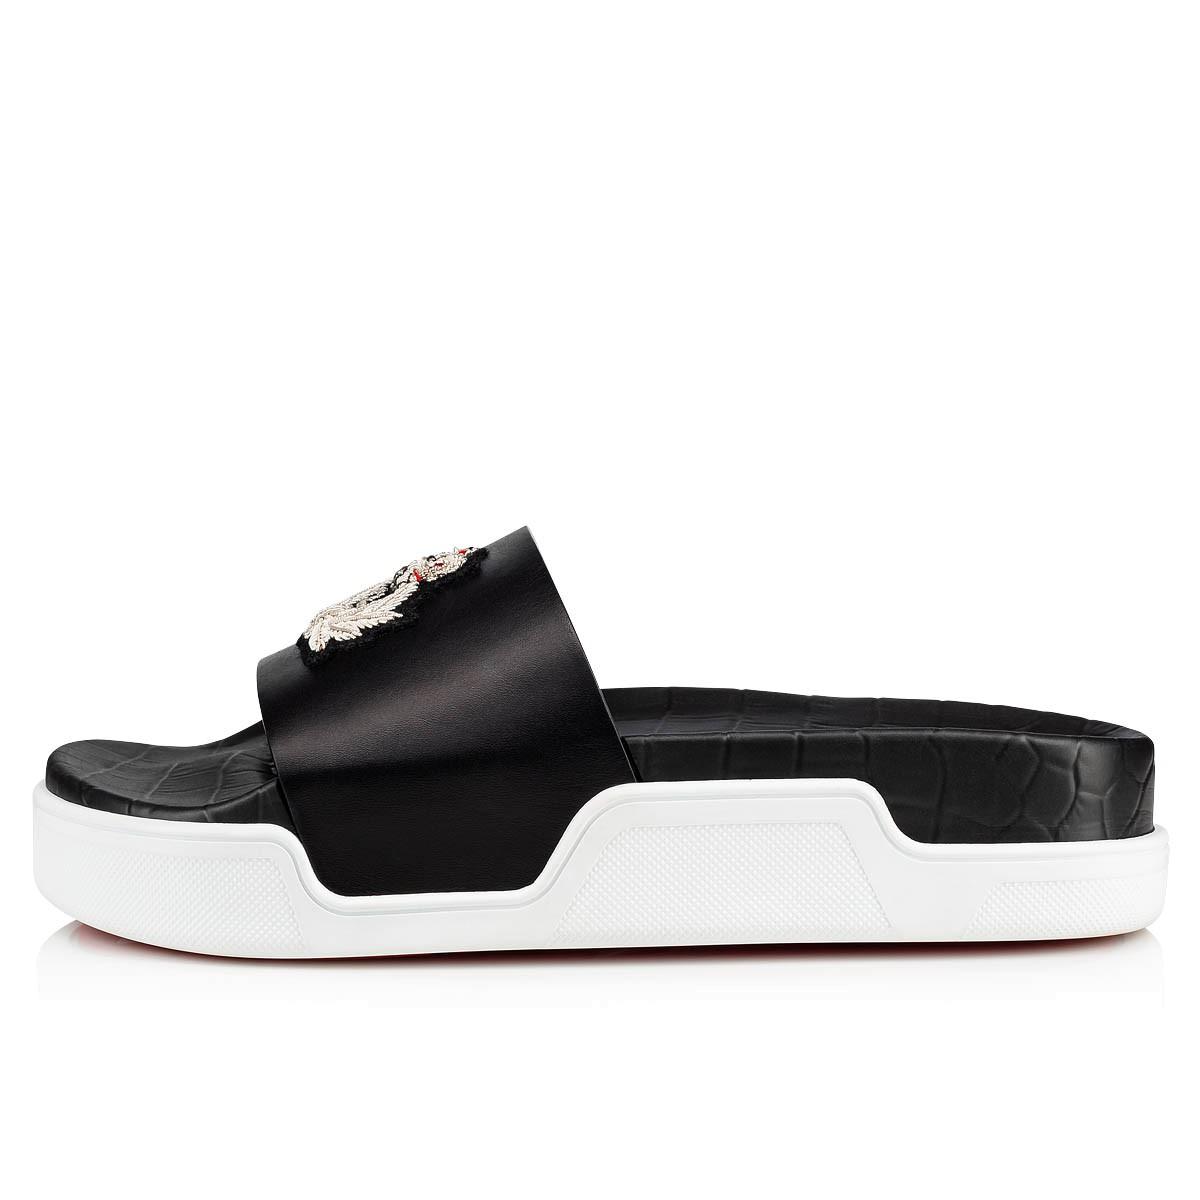 Shoes - Pool Beau Donna Flat - Christian Louboutin